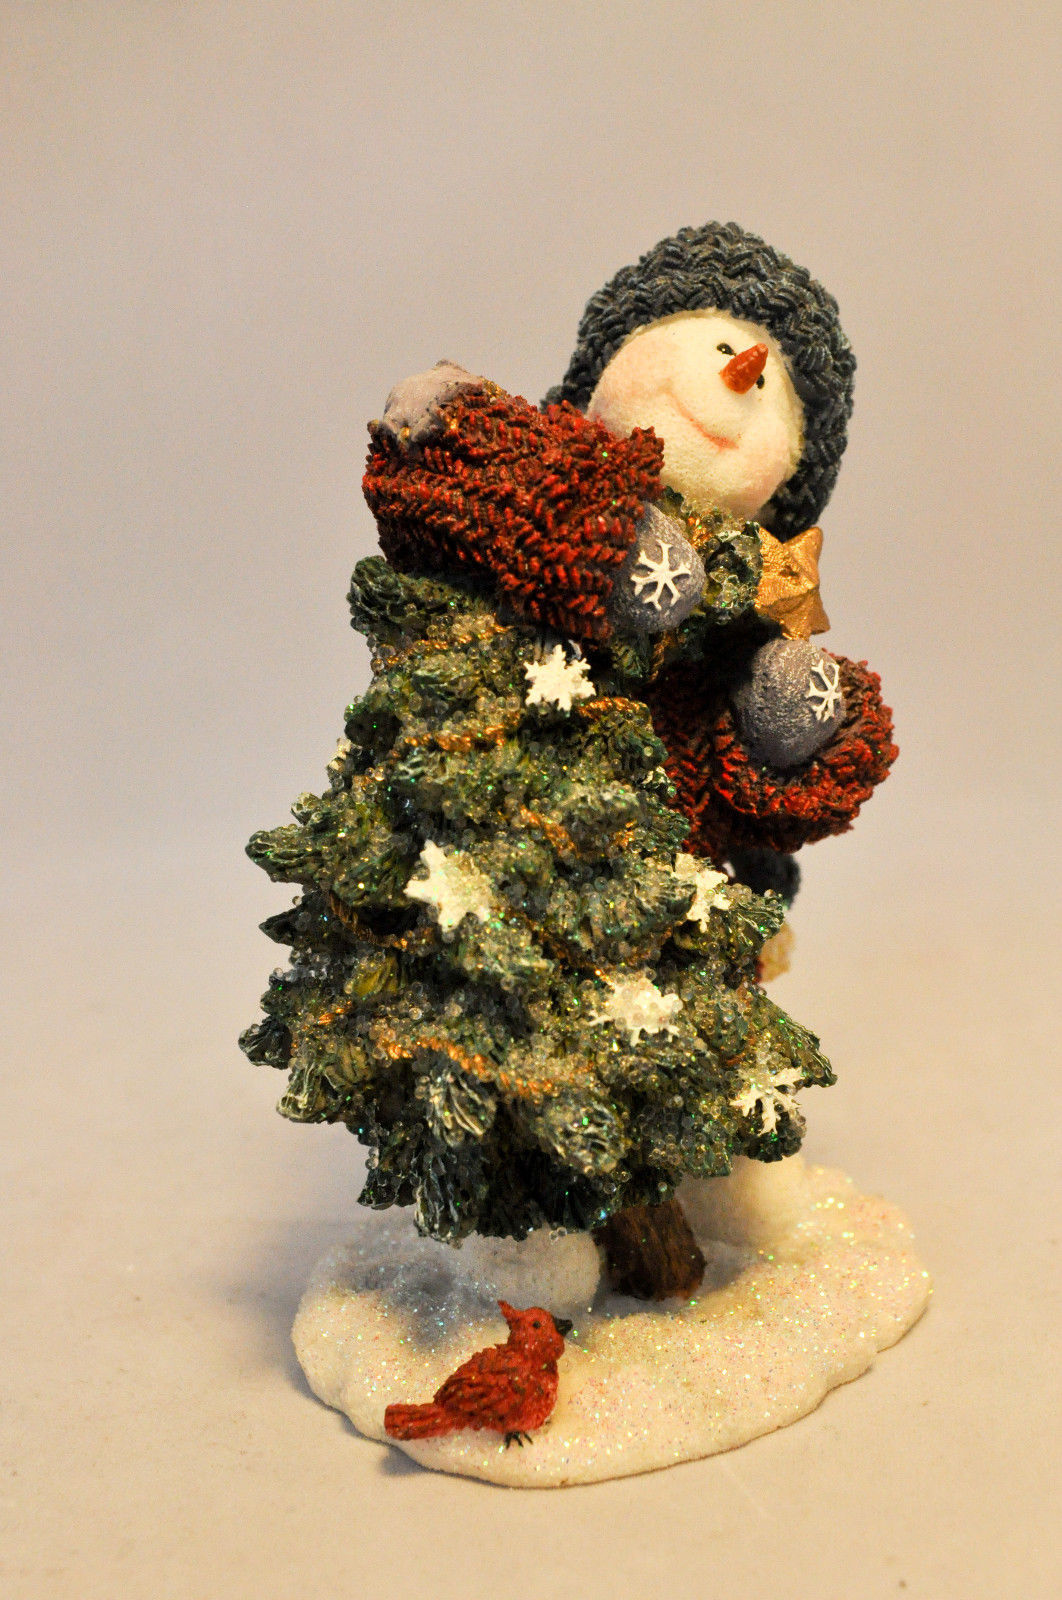 Boyds Bears & Friends: Douglas ... Sprucin' Up The Tree - Style 36524 image 8